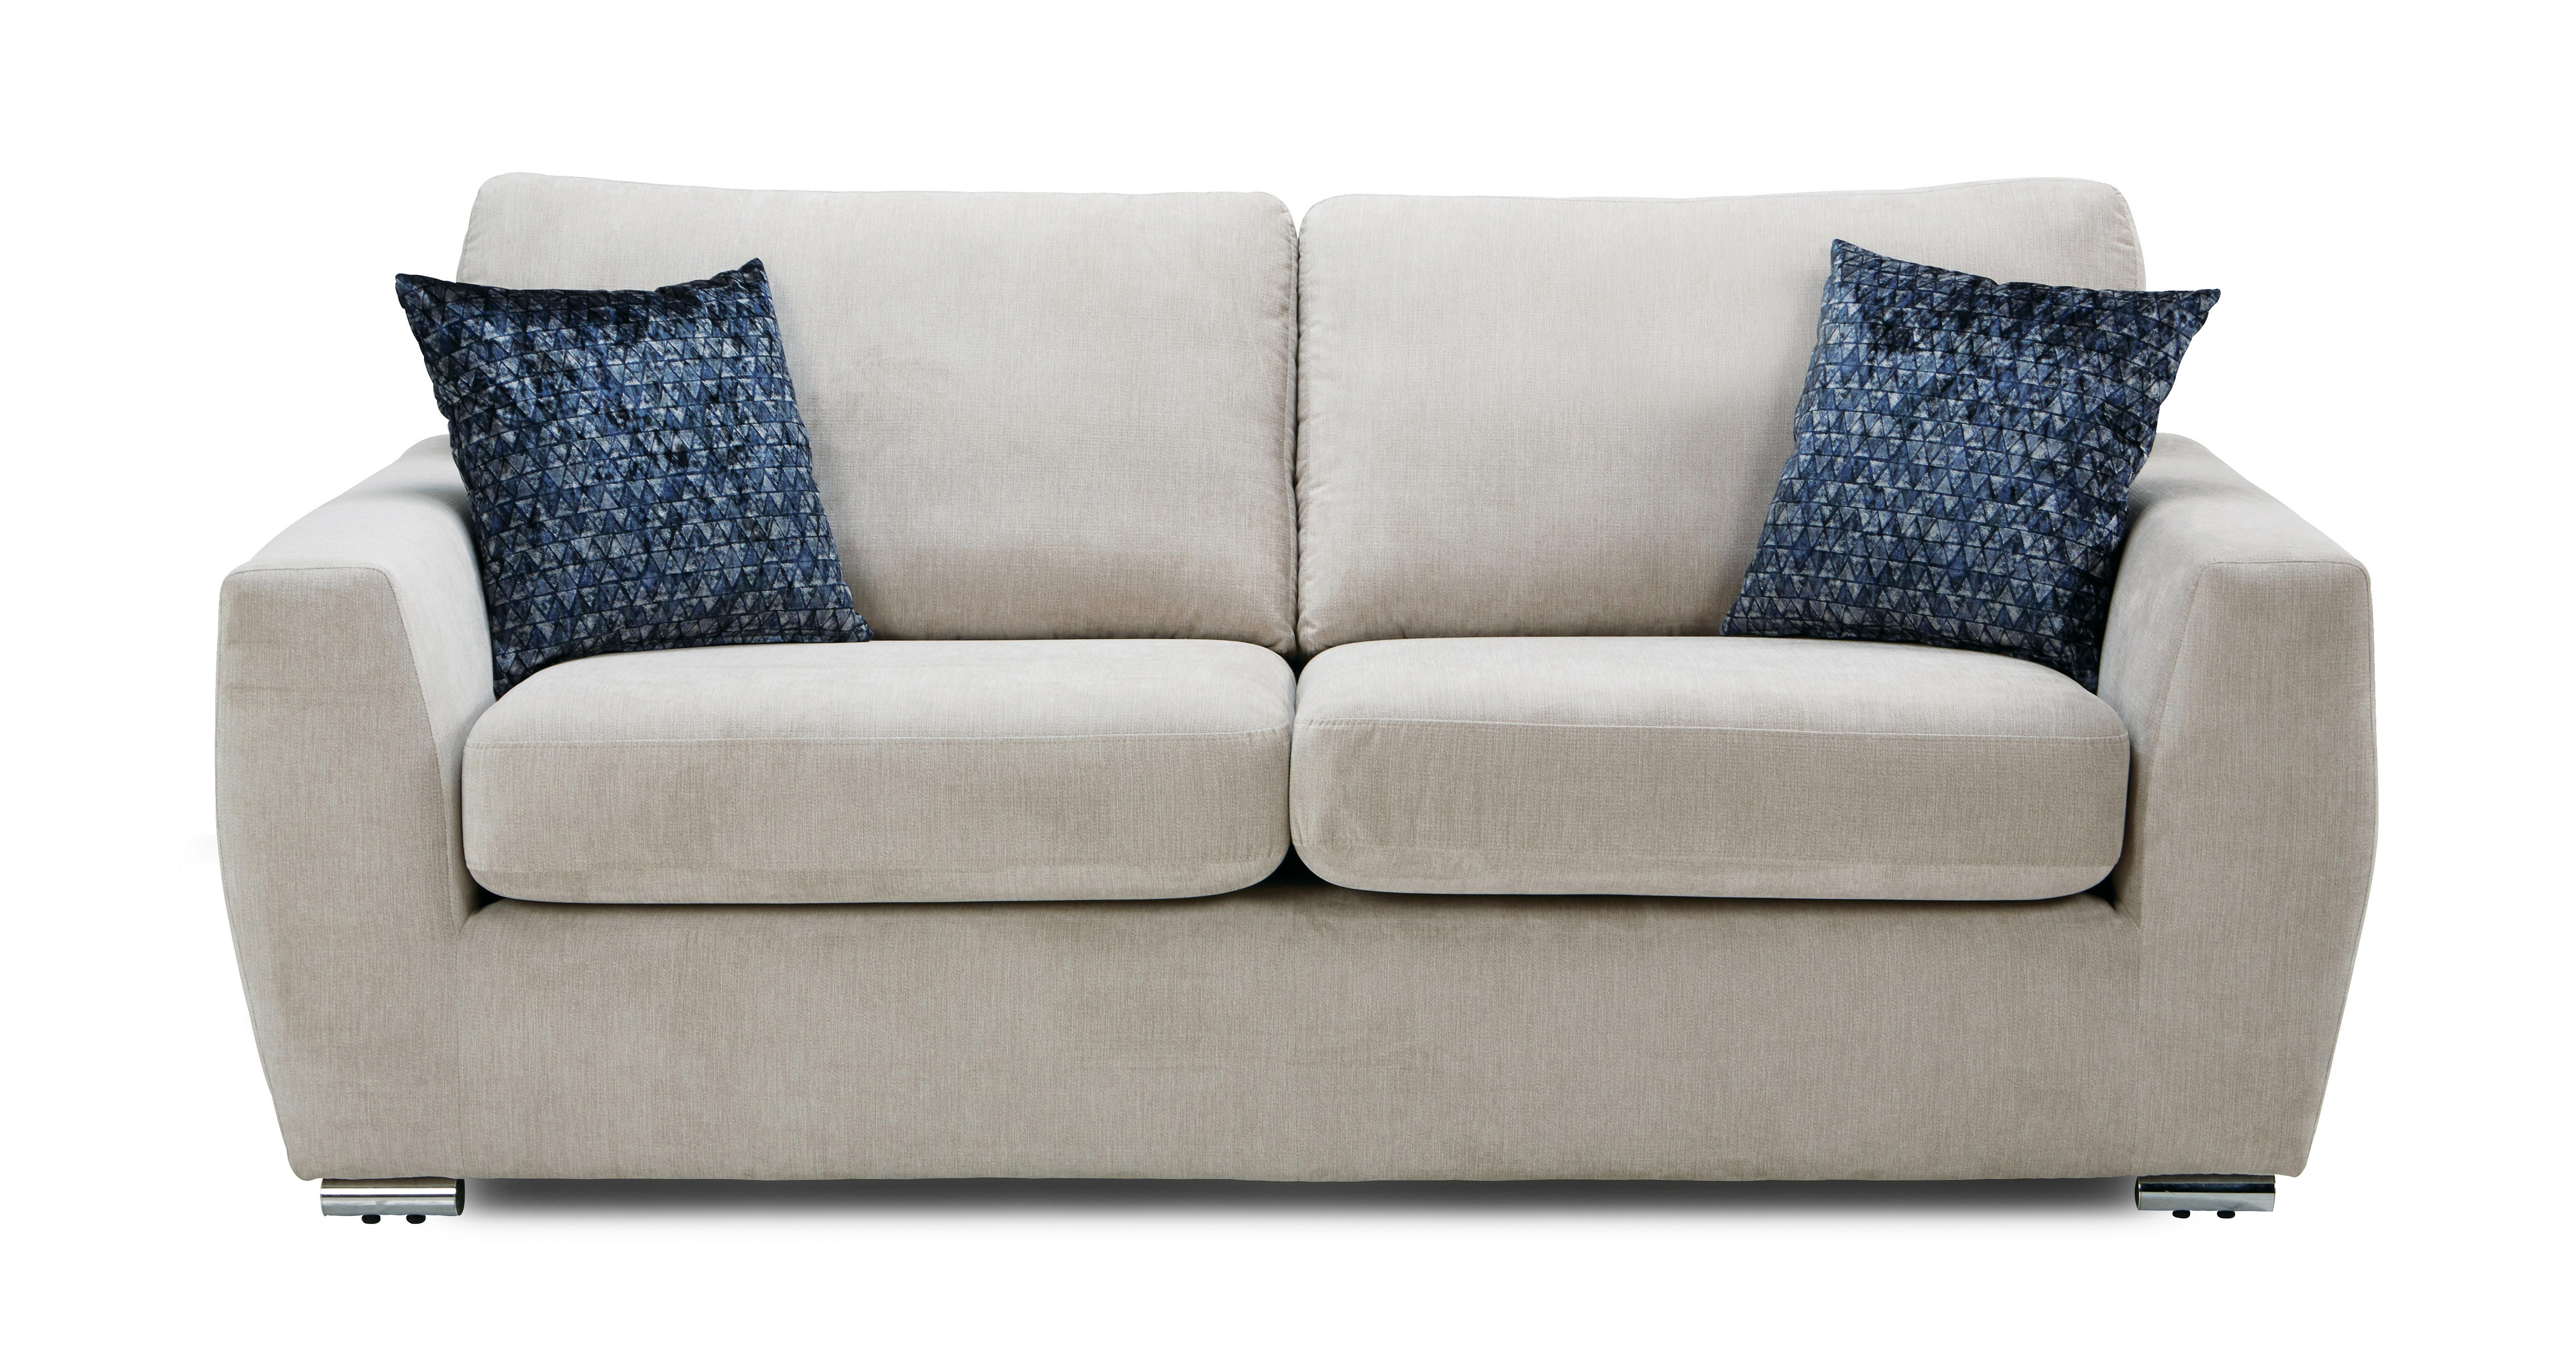 Astoria Clearance 3 Seater Sofa Armchair & Footstool Plaza